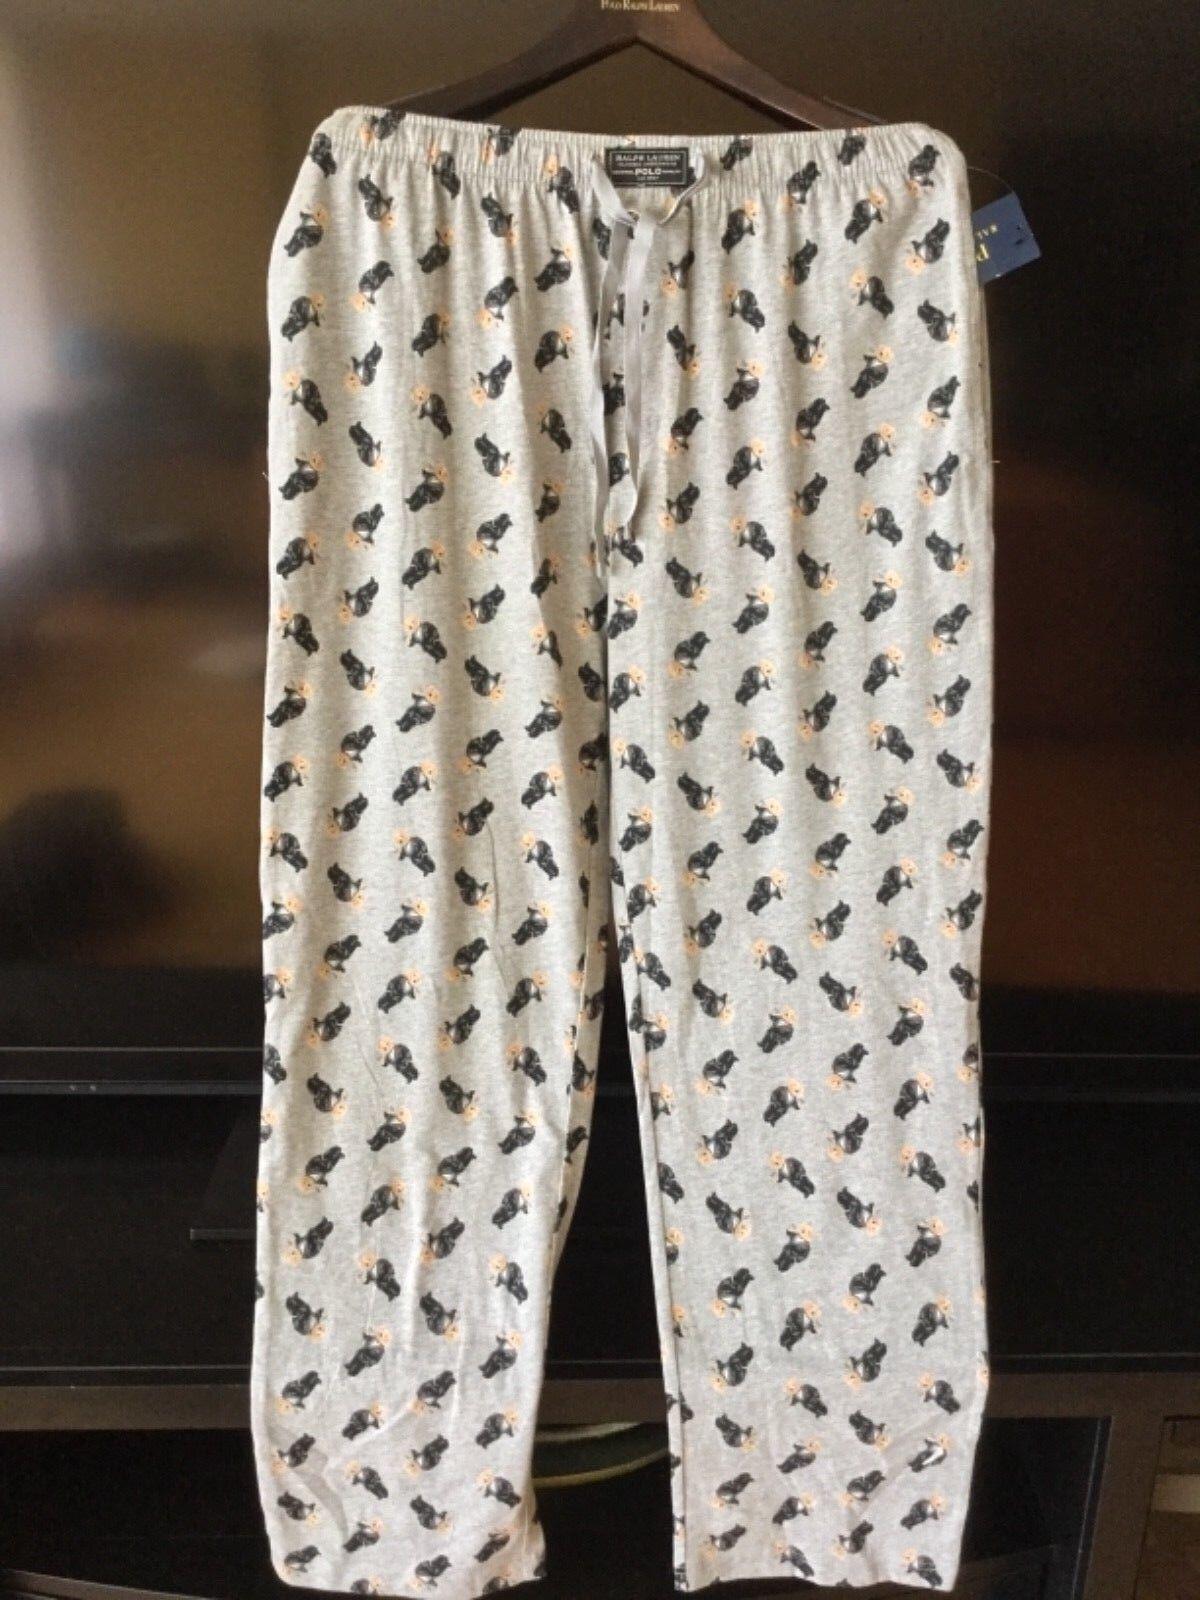 Ralph Lauren Polo Bear Relax fit lounge pajama Pants sz L 100% Cotton NWT